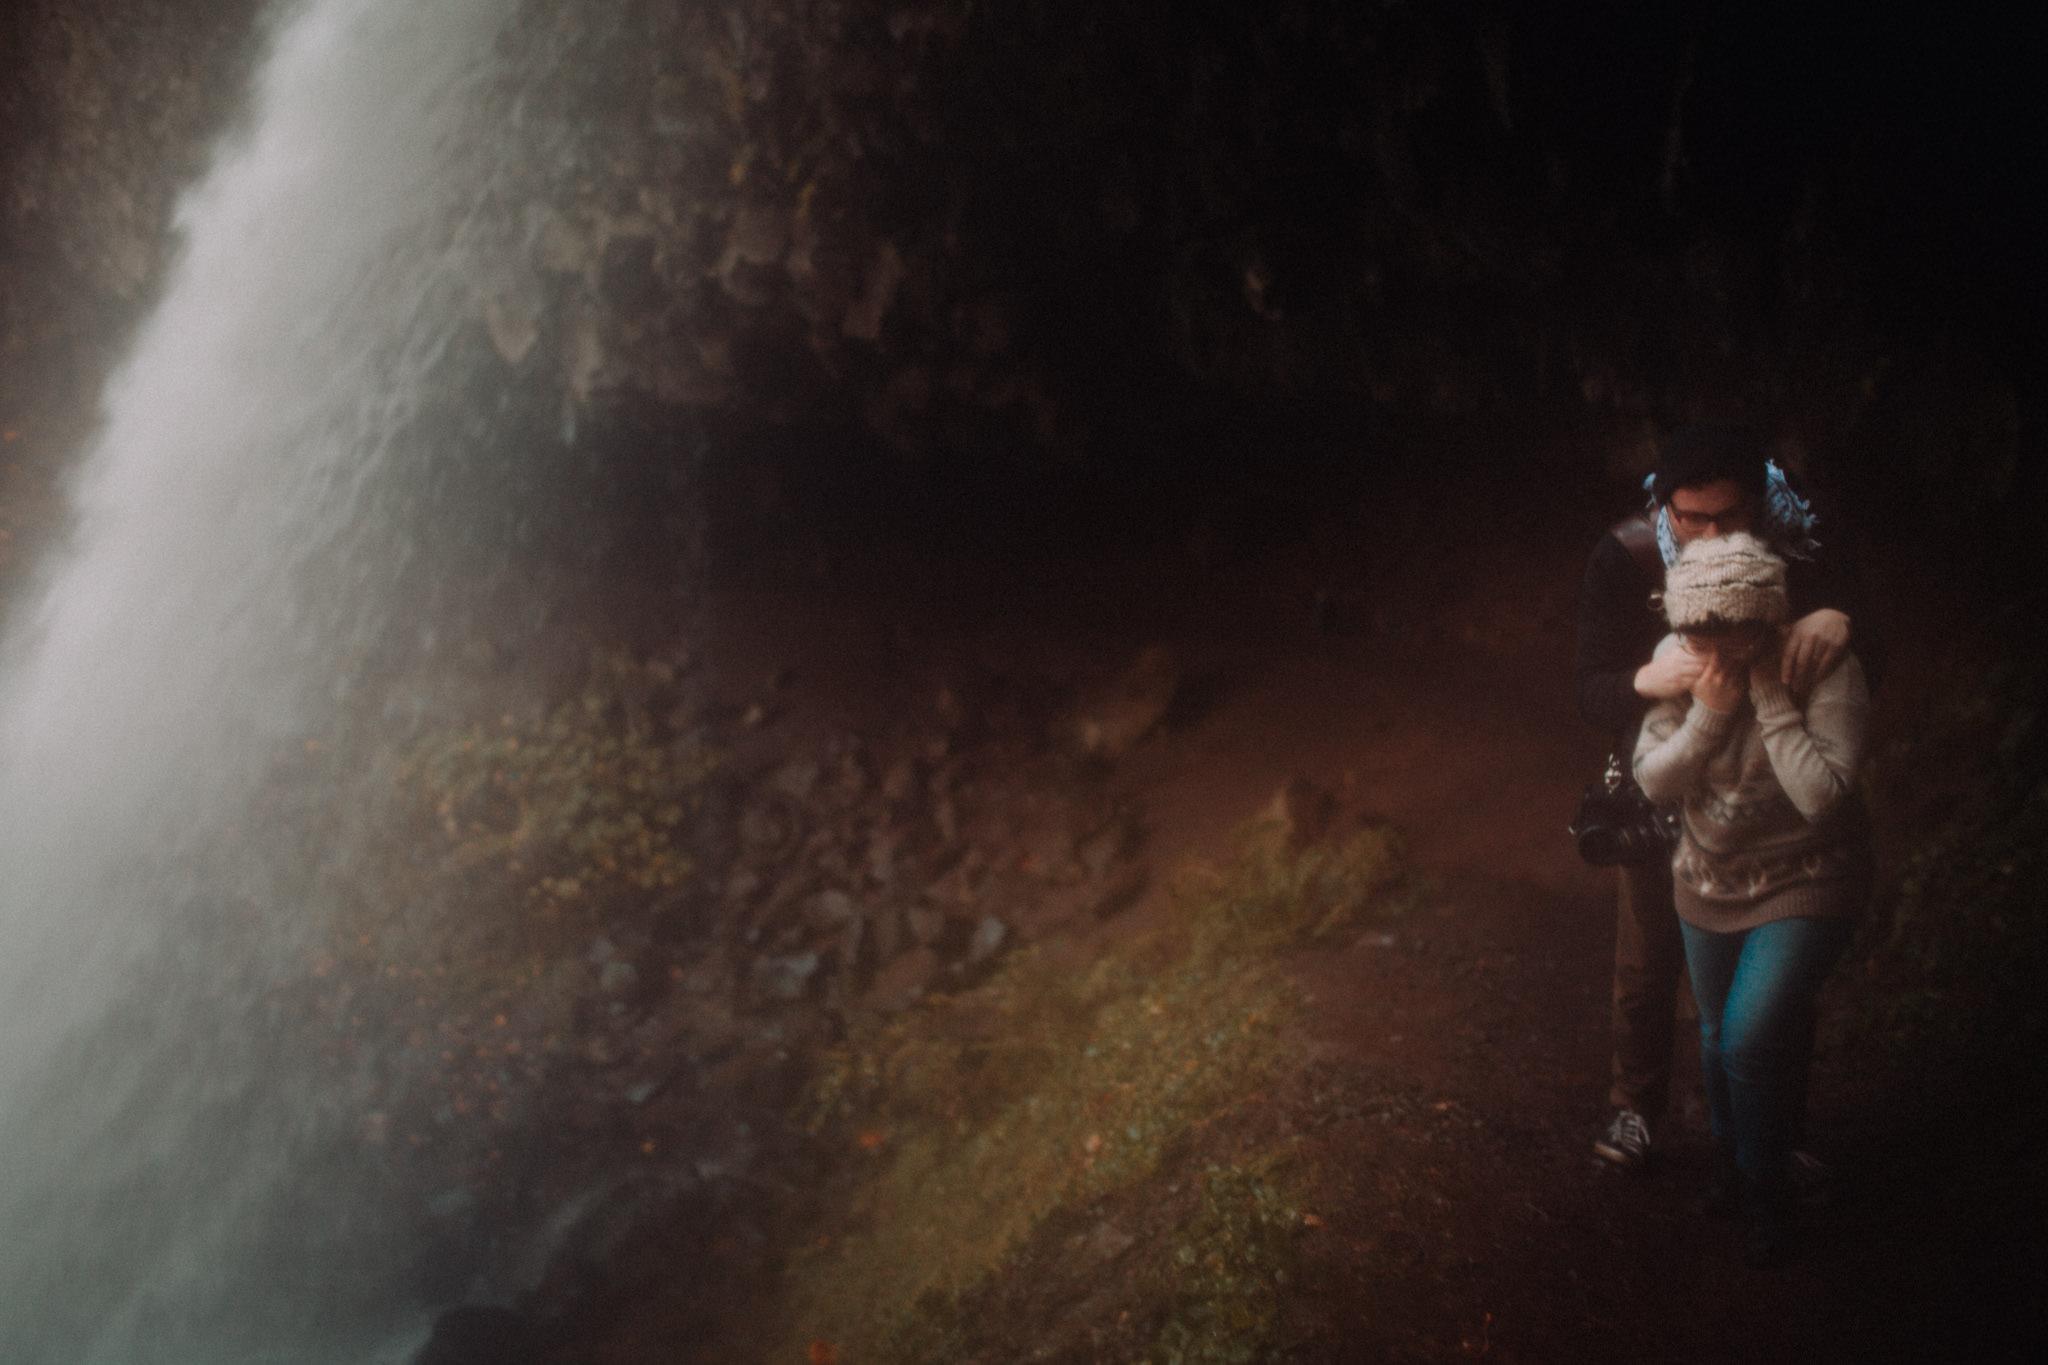 oregon-wedding-elopement-photographer-donmashelen-bringas9